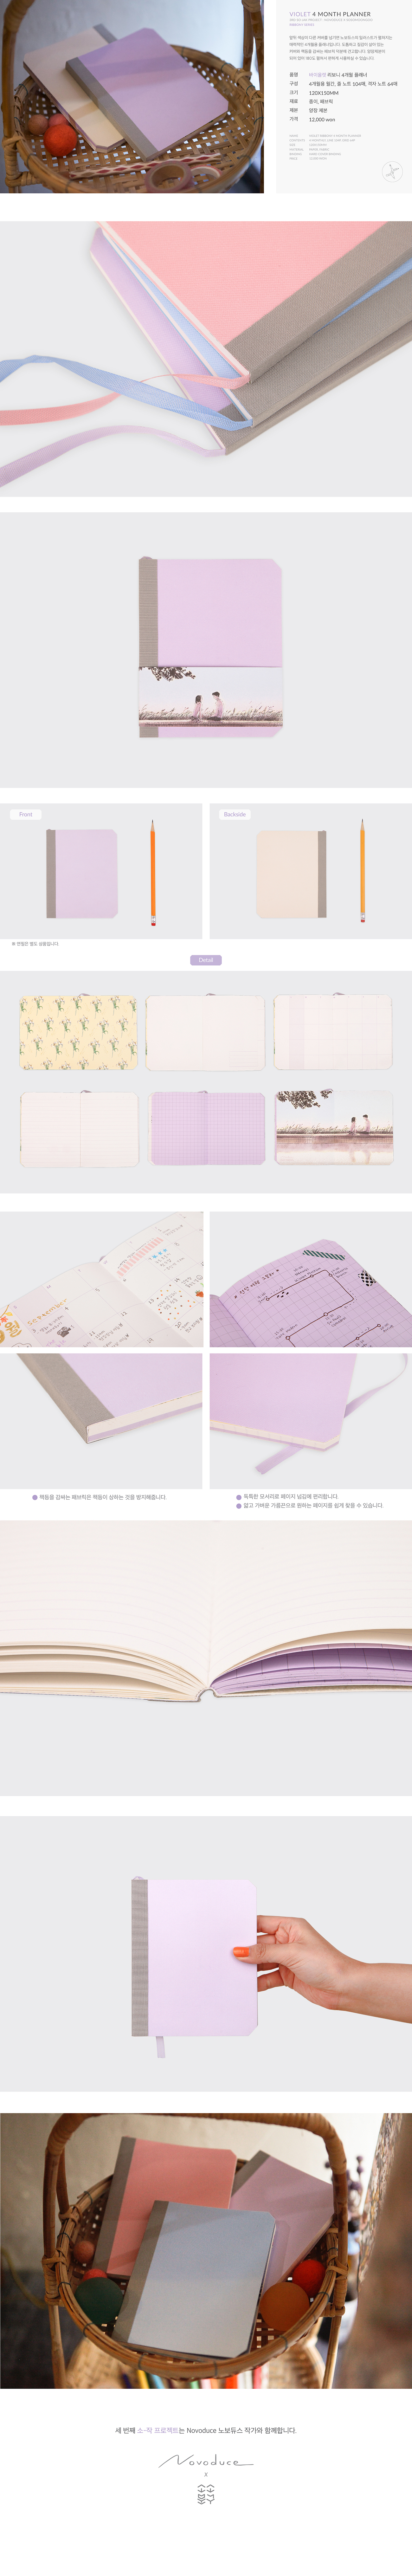 violet ribbony 4month planner - 소소문구, 12,000원, 플래너, 먼슬리플래너